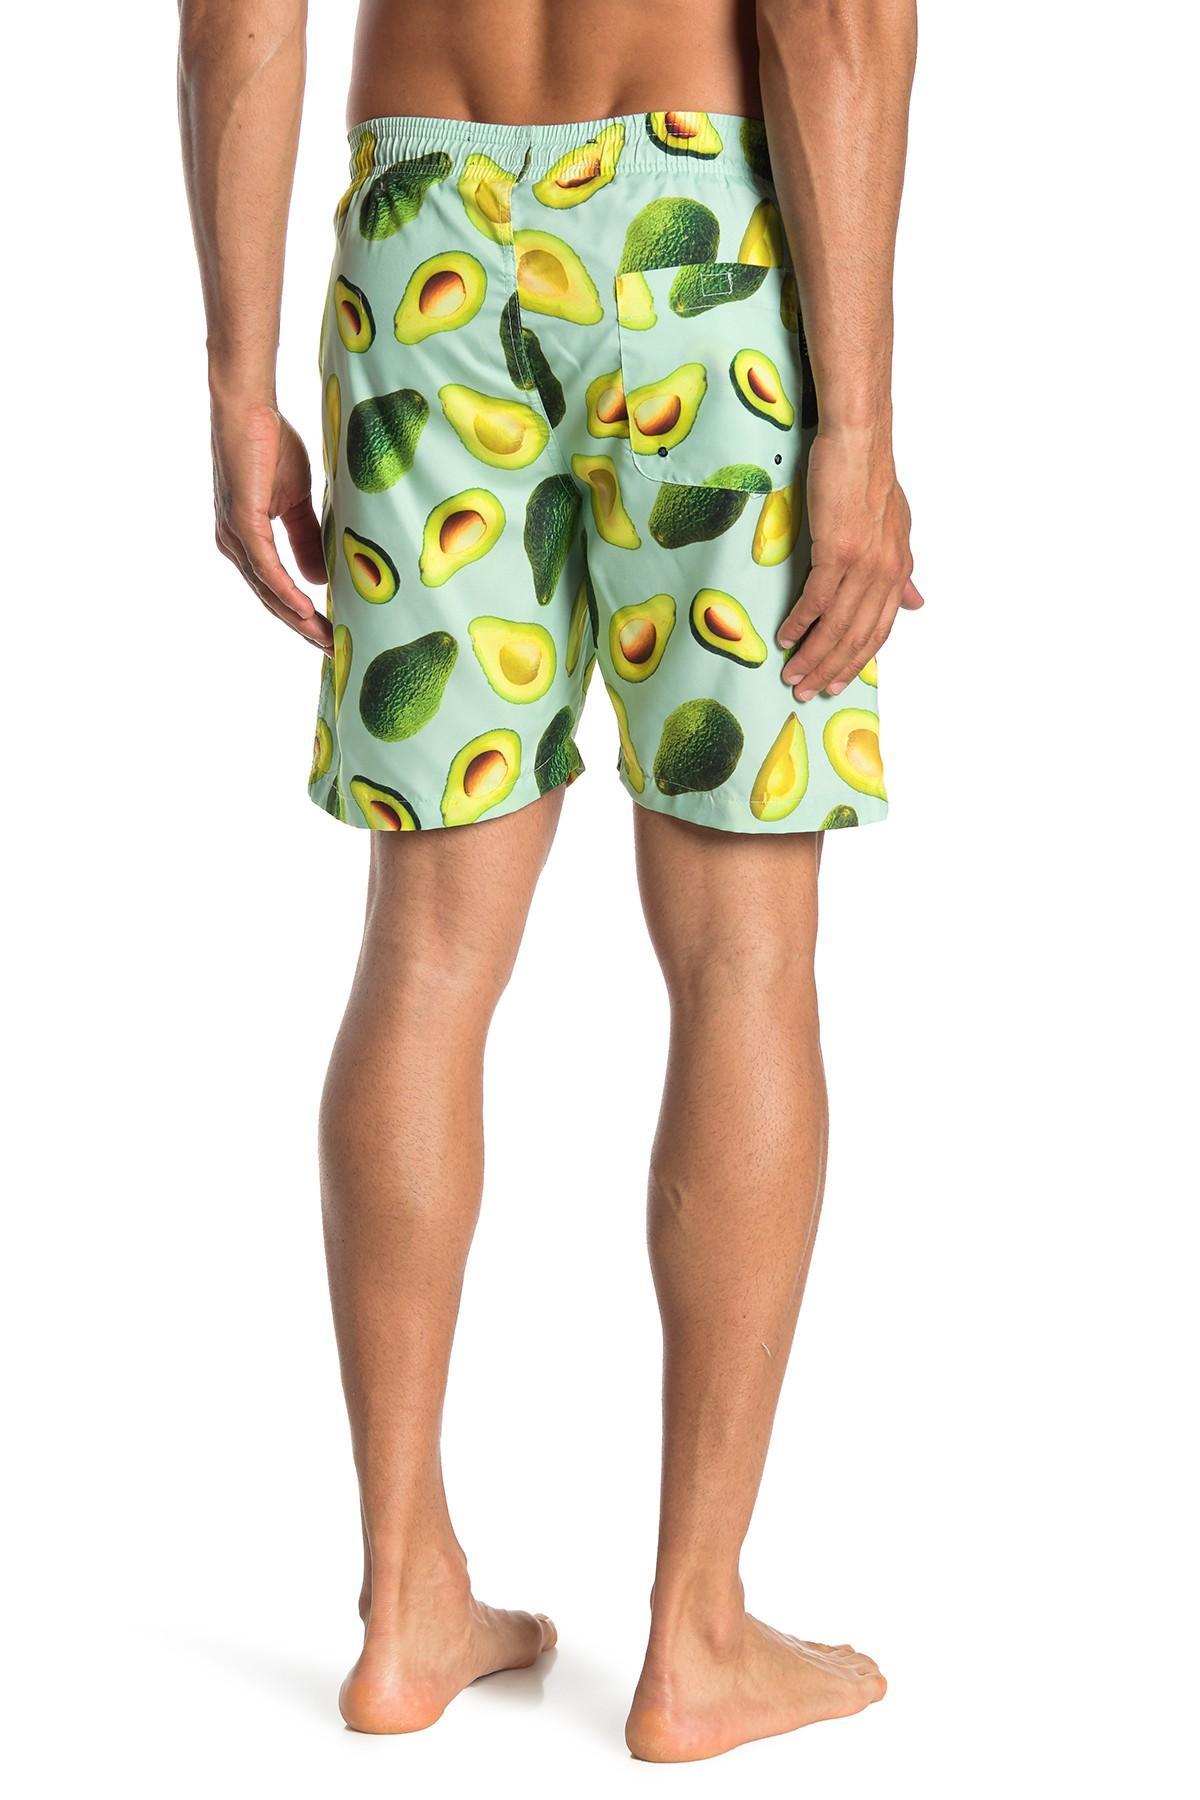 d591585e67 The Narrows - Green Avocado Volley Swim Shorts for Men - Lyst. View  fullscreen